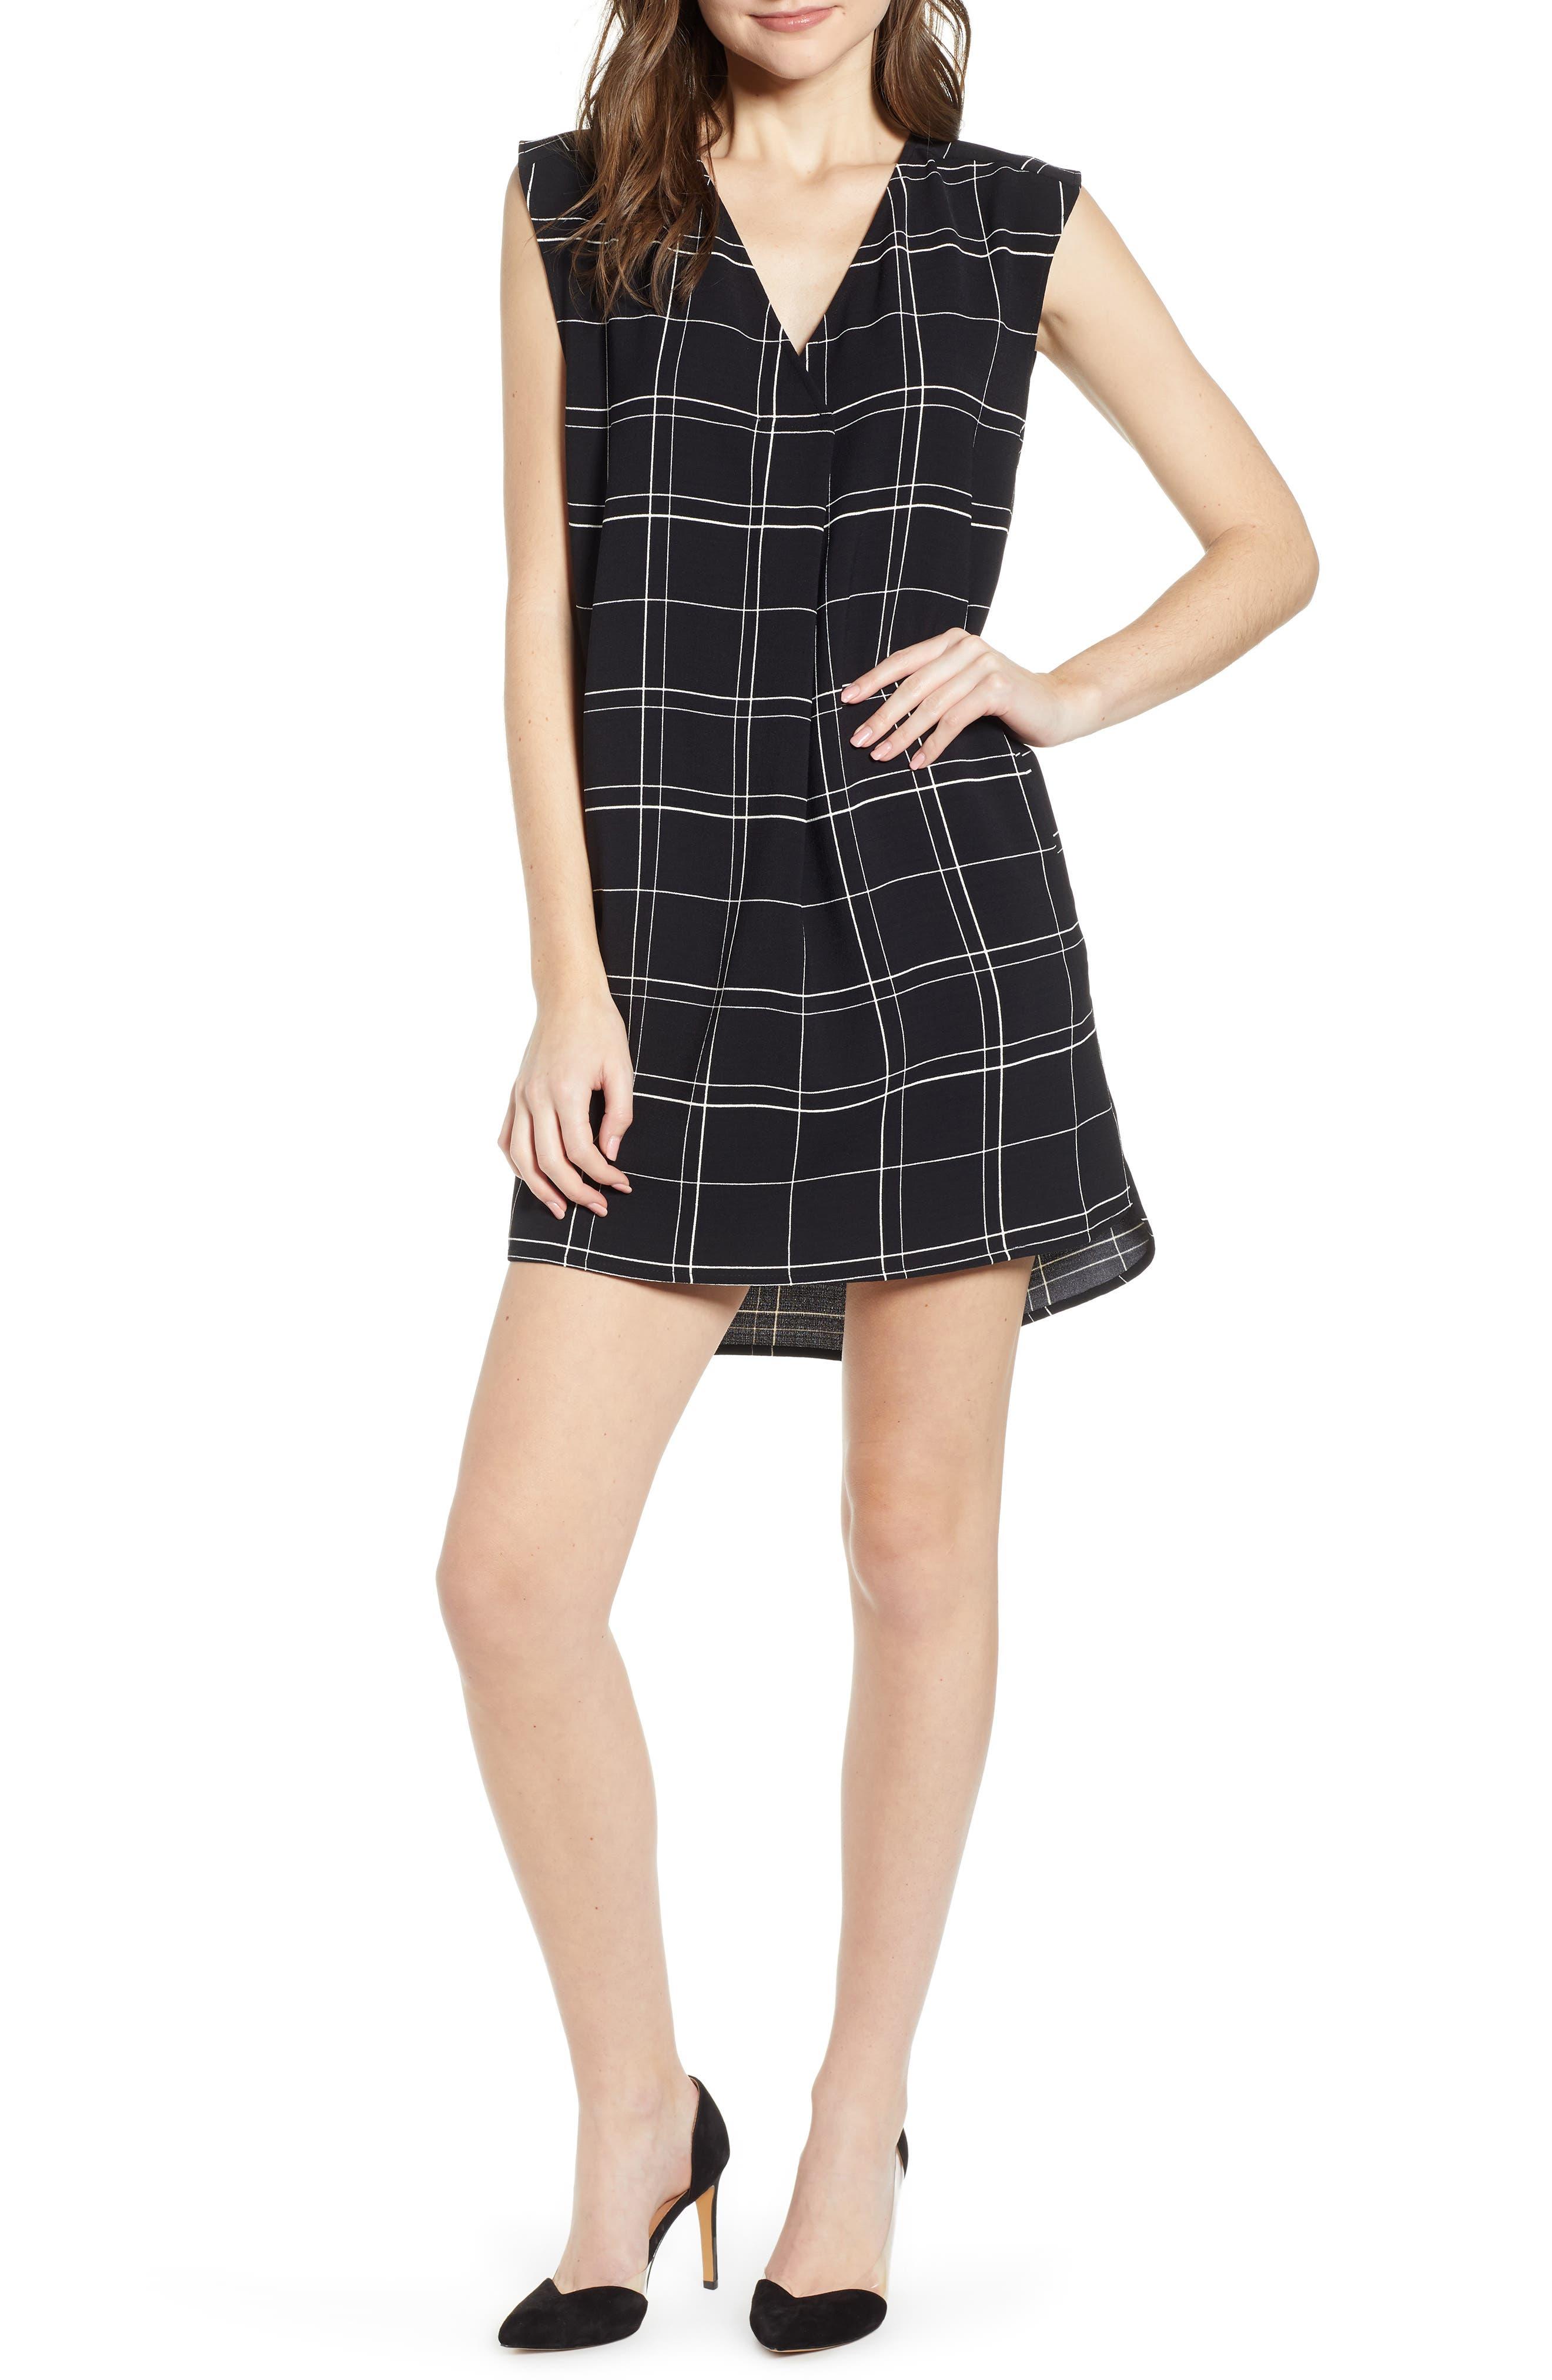 LEITH Everyday Dress, Main, color, BLACK GLAM CITY CHECK